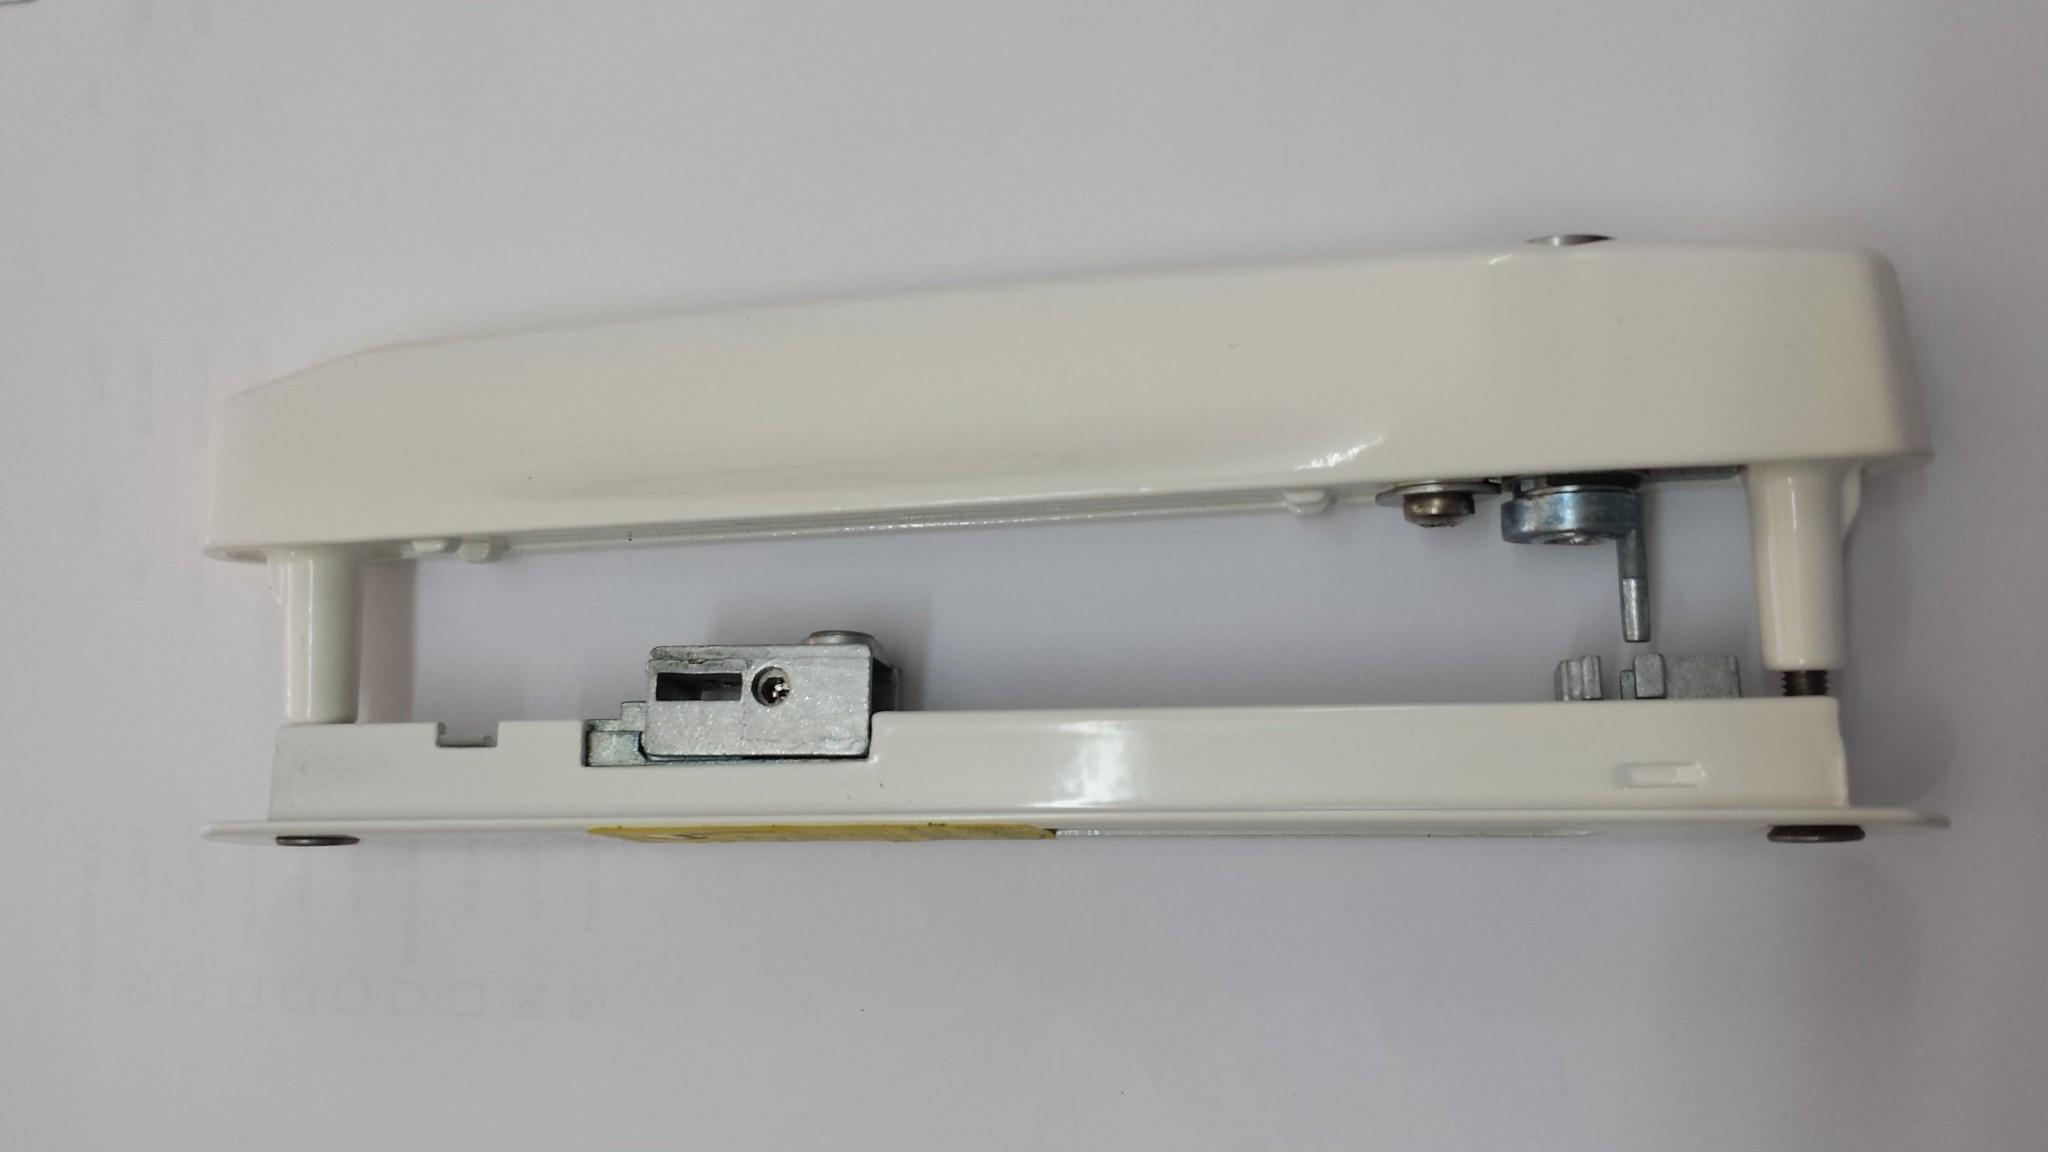 Serrure Pour Porte Coulissante De Veranda Pro égeons Vos Portes - Serrure porte coulissante aluminium veranda